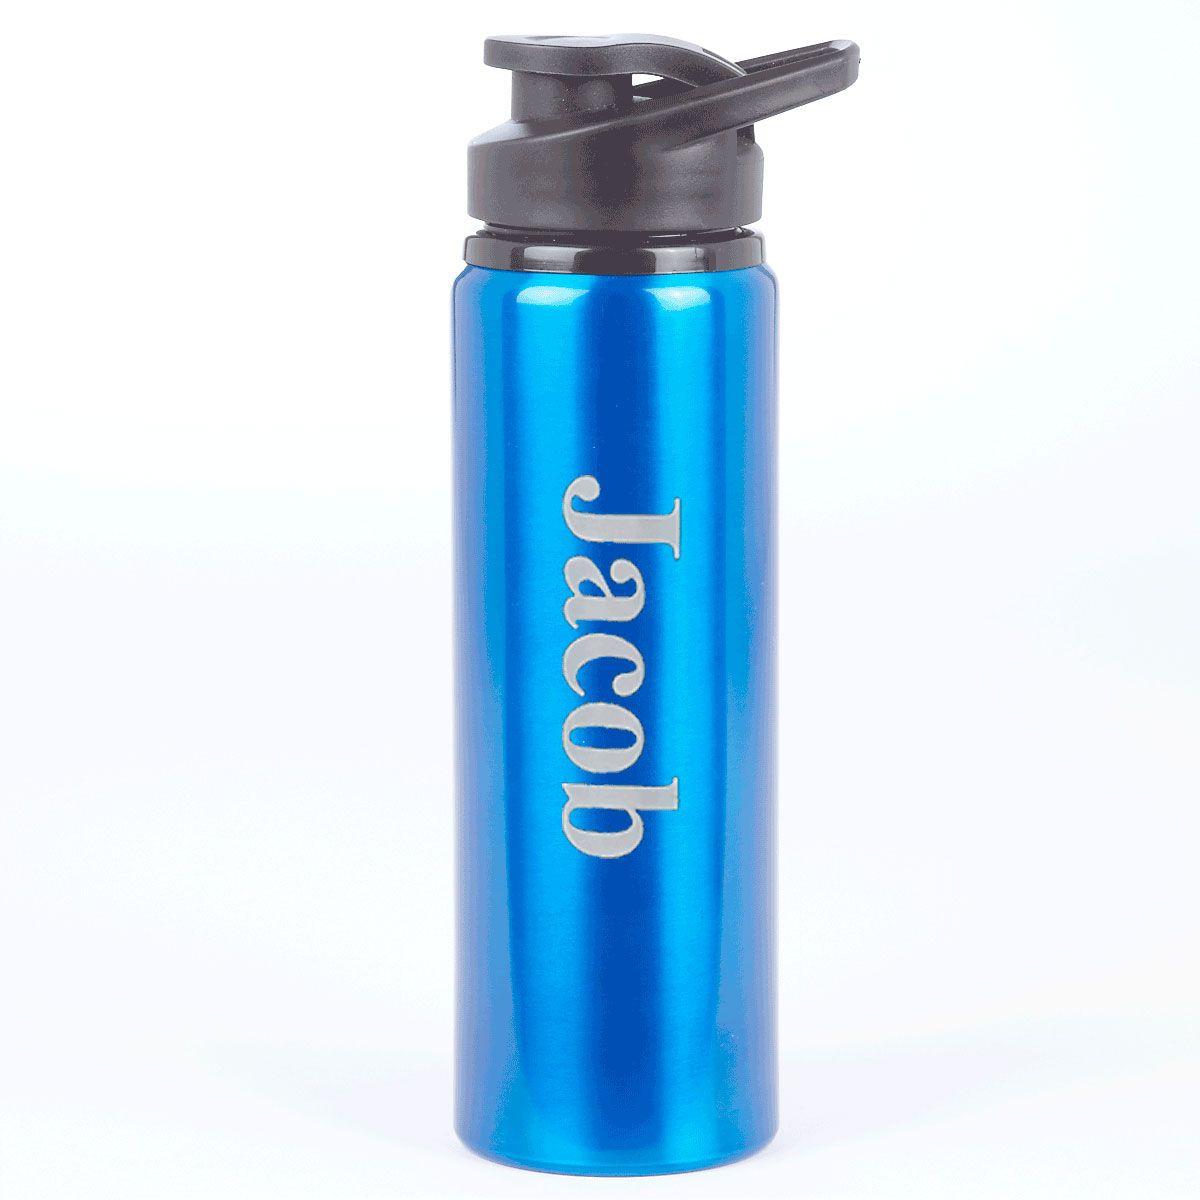 Personalized Anodized Aluminium Water Bottle - Blue